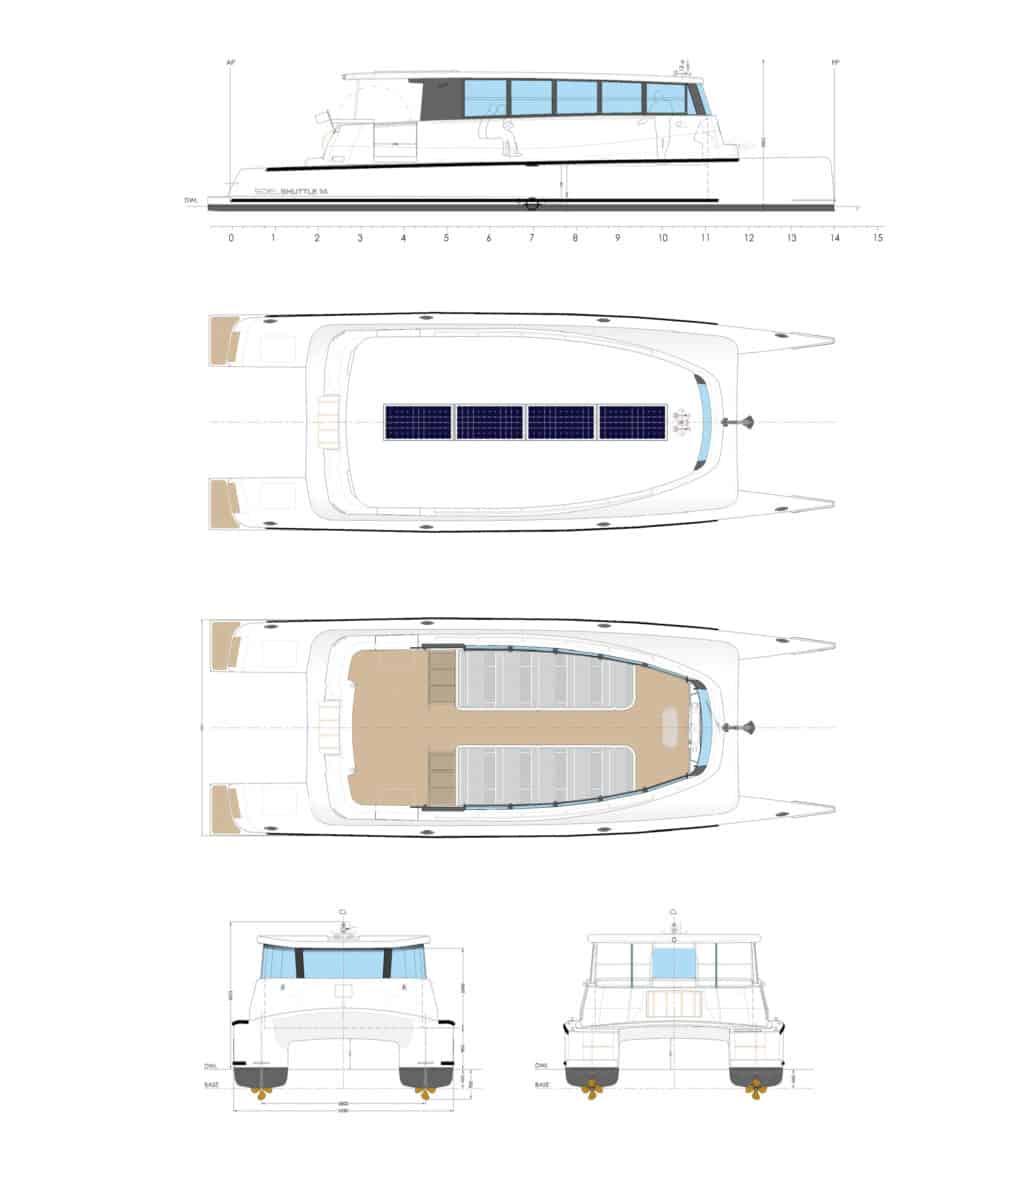 Side view solar electric yacht Soel Senses 48